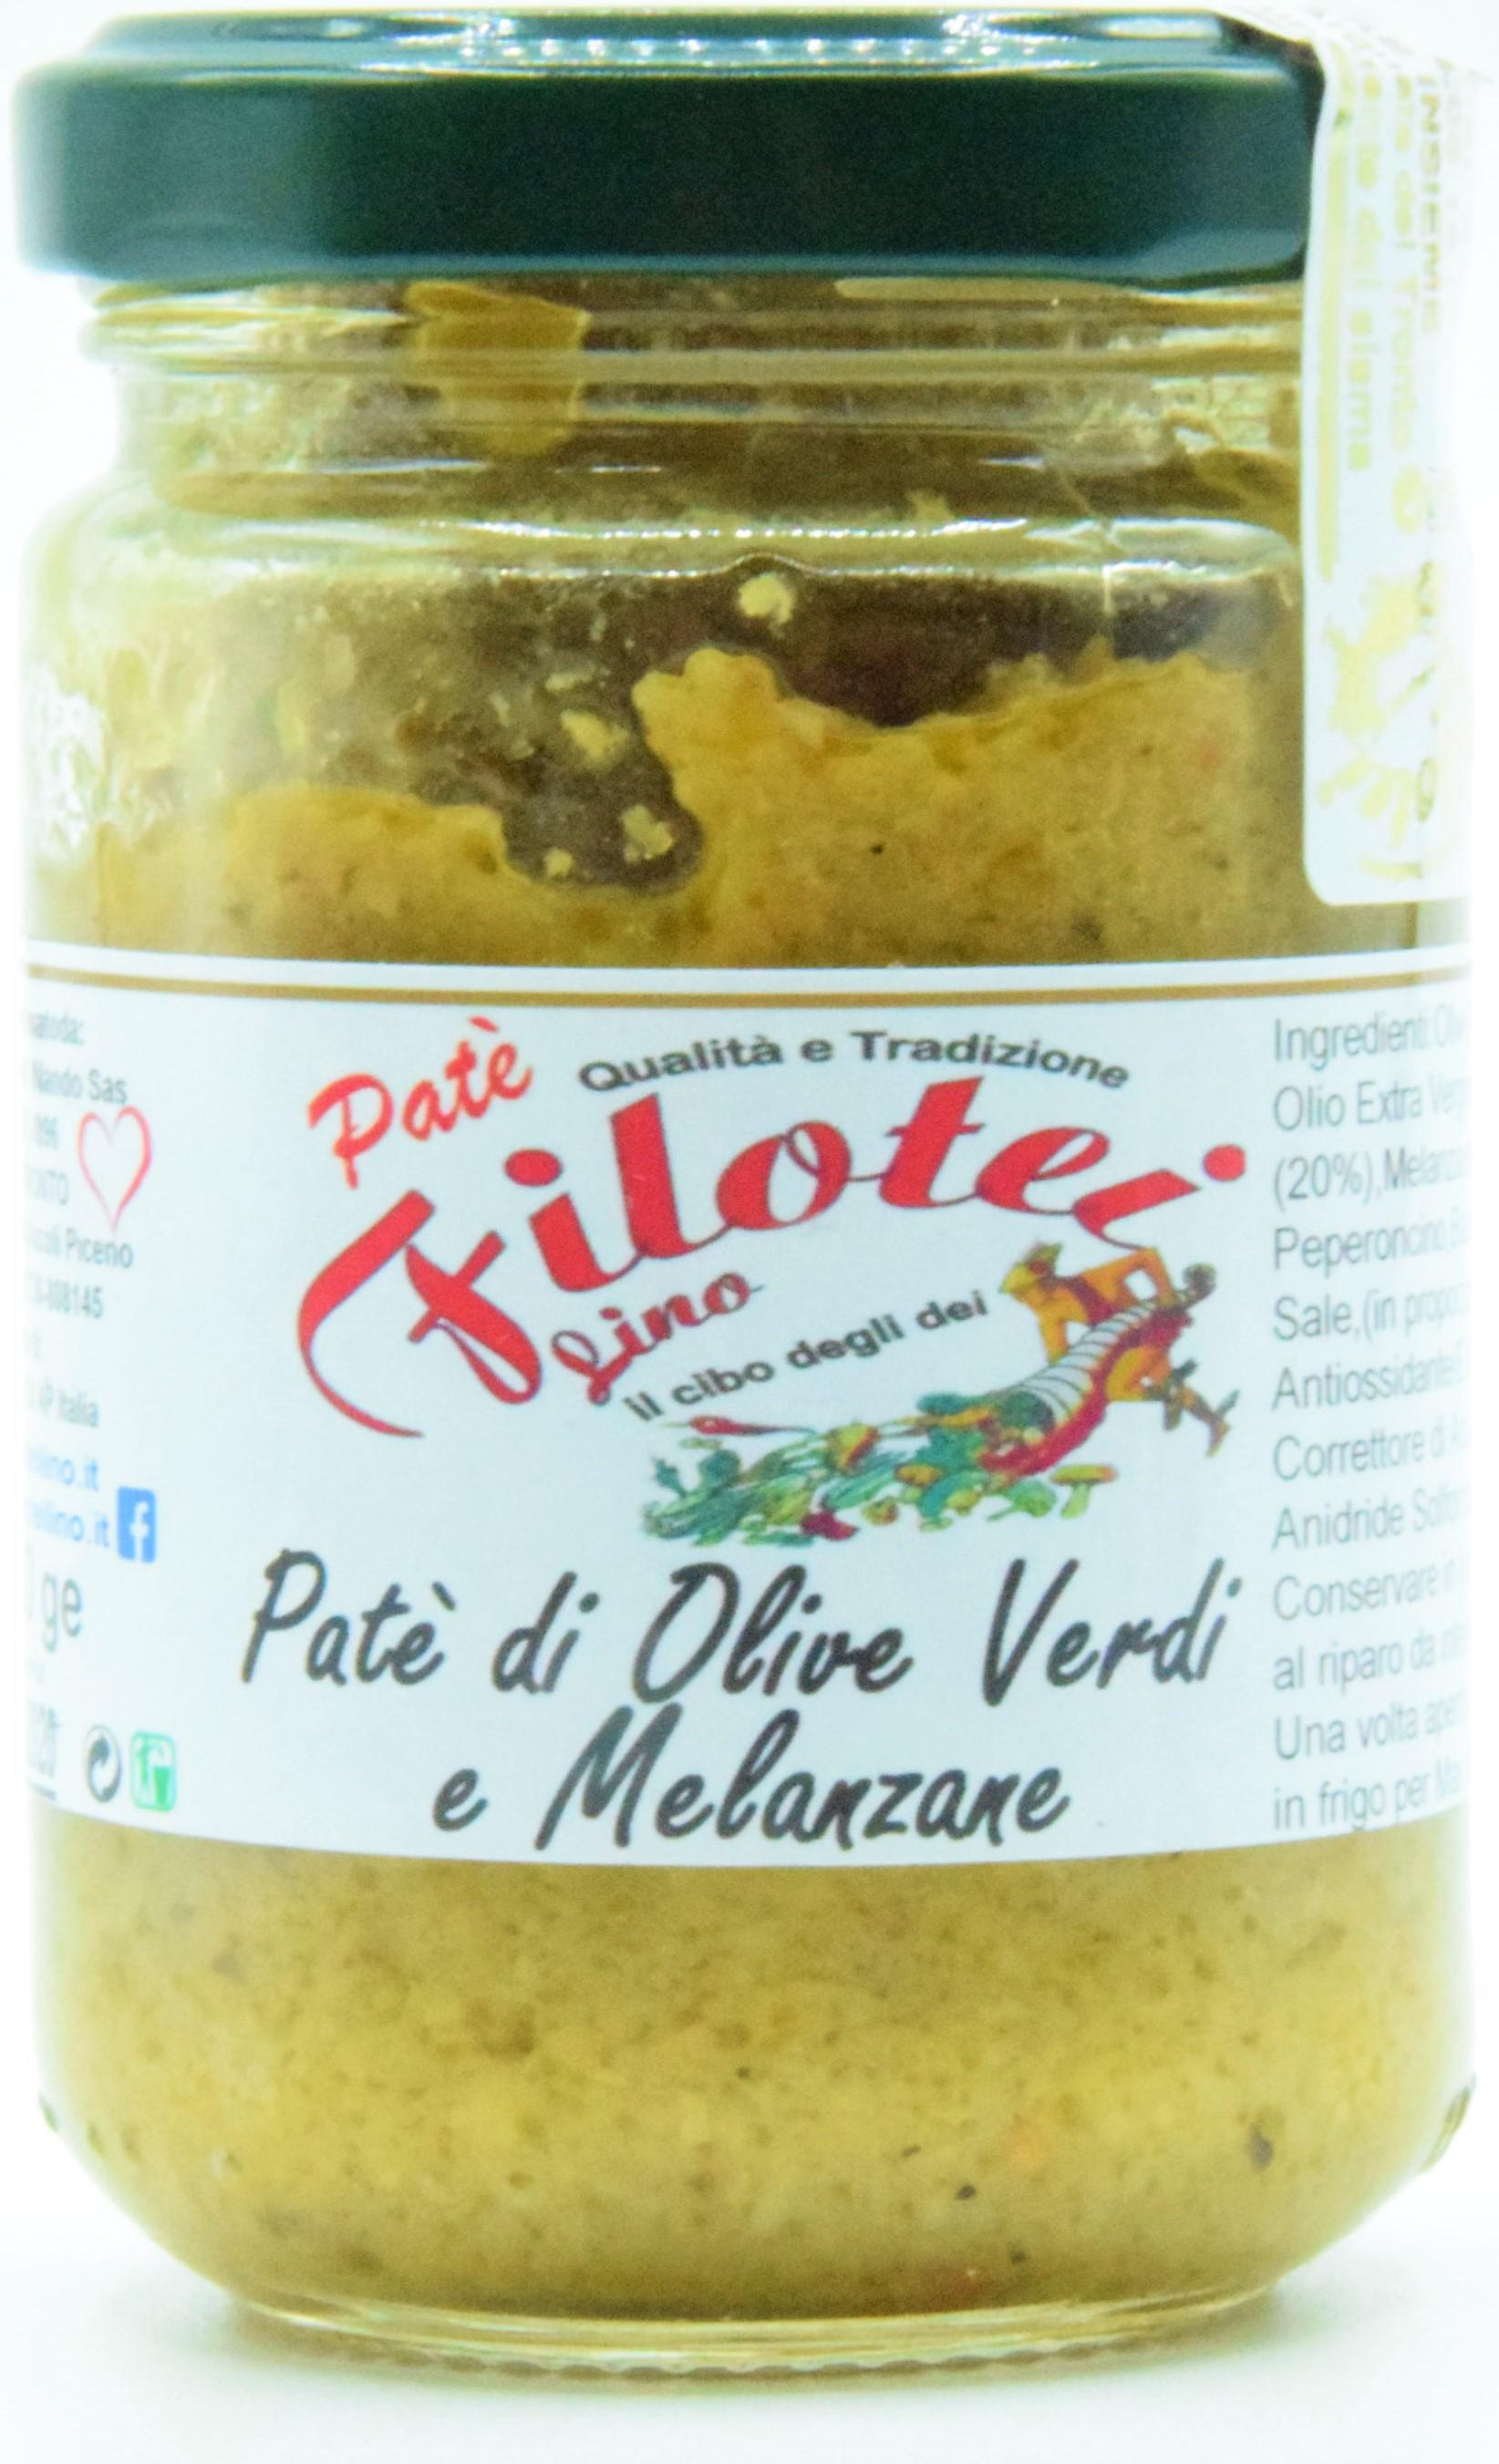 Paté di Olive Verdi e Melanzane